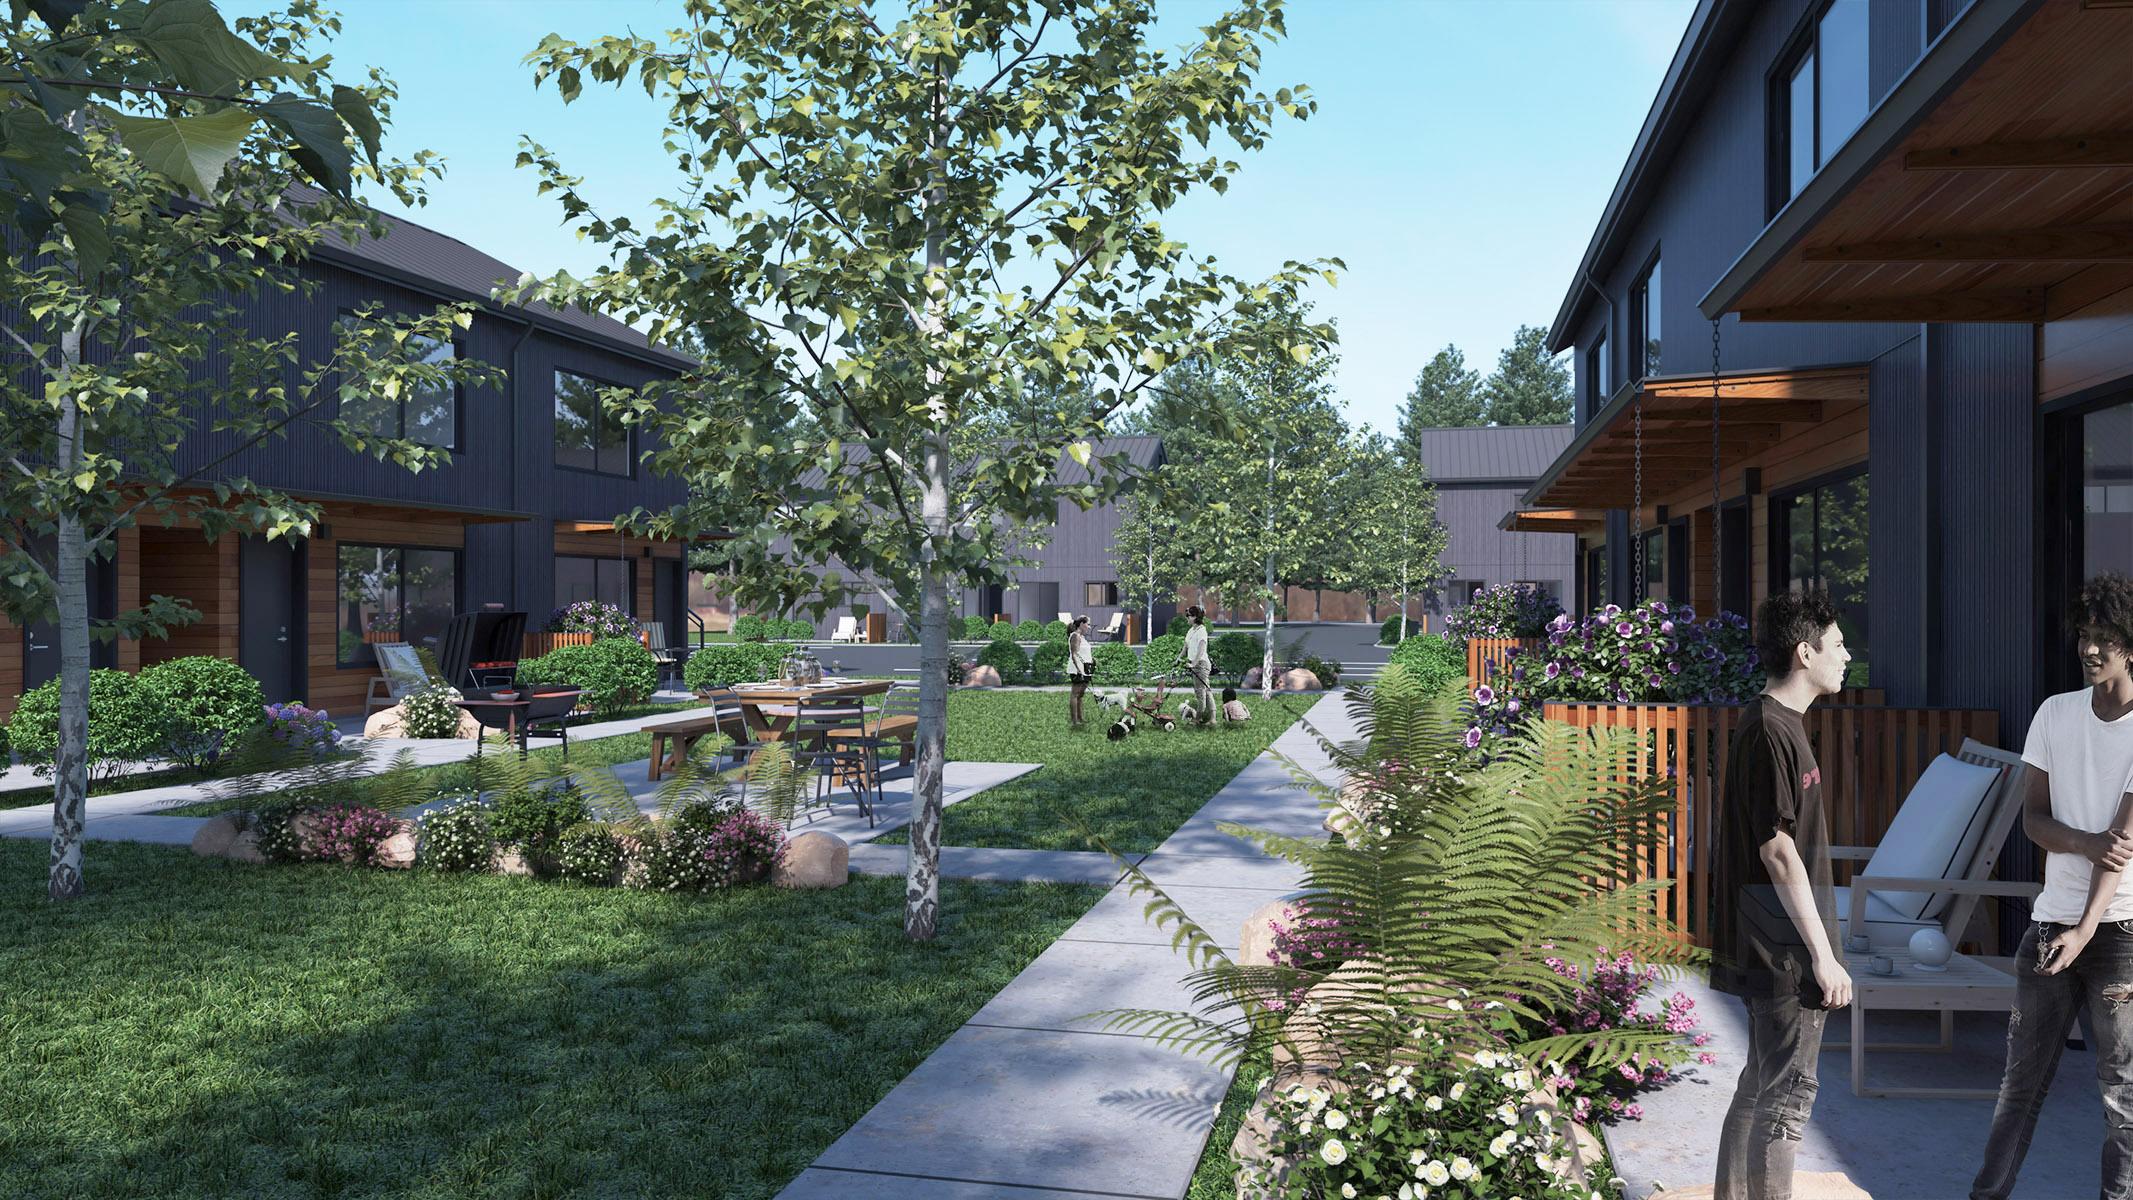 Affordable Housing Exterior & Energy Updates  - Community Center - Day.jpg